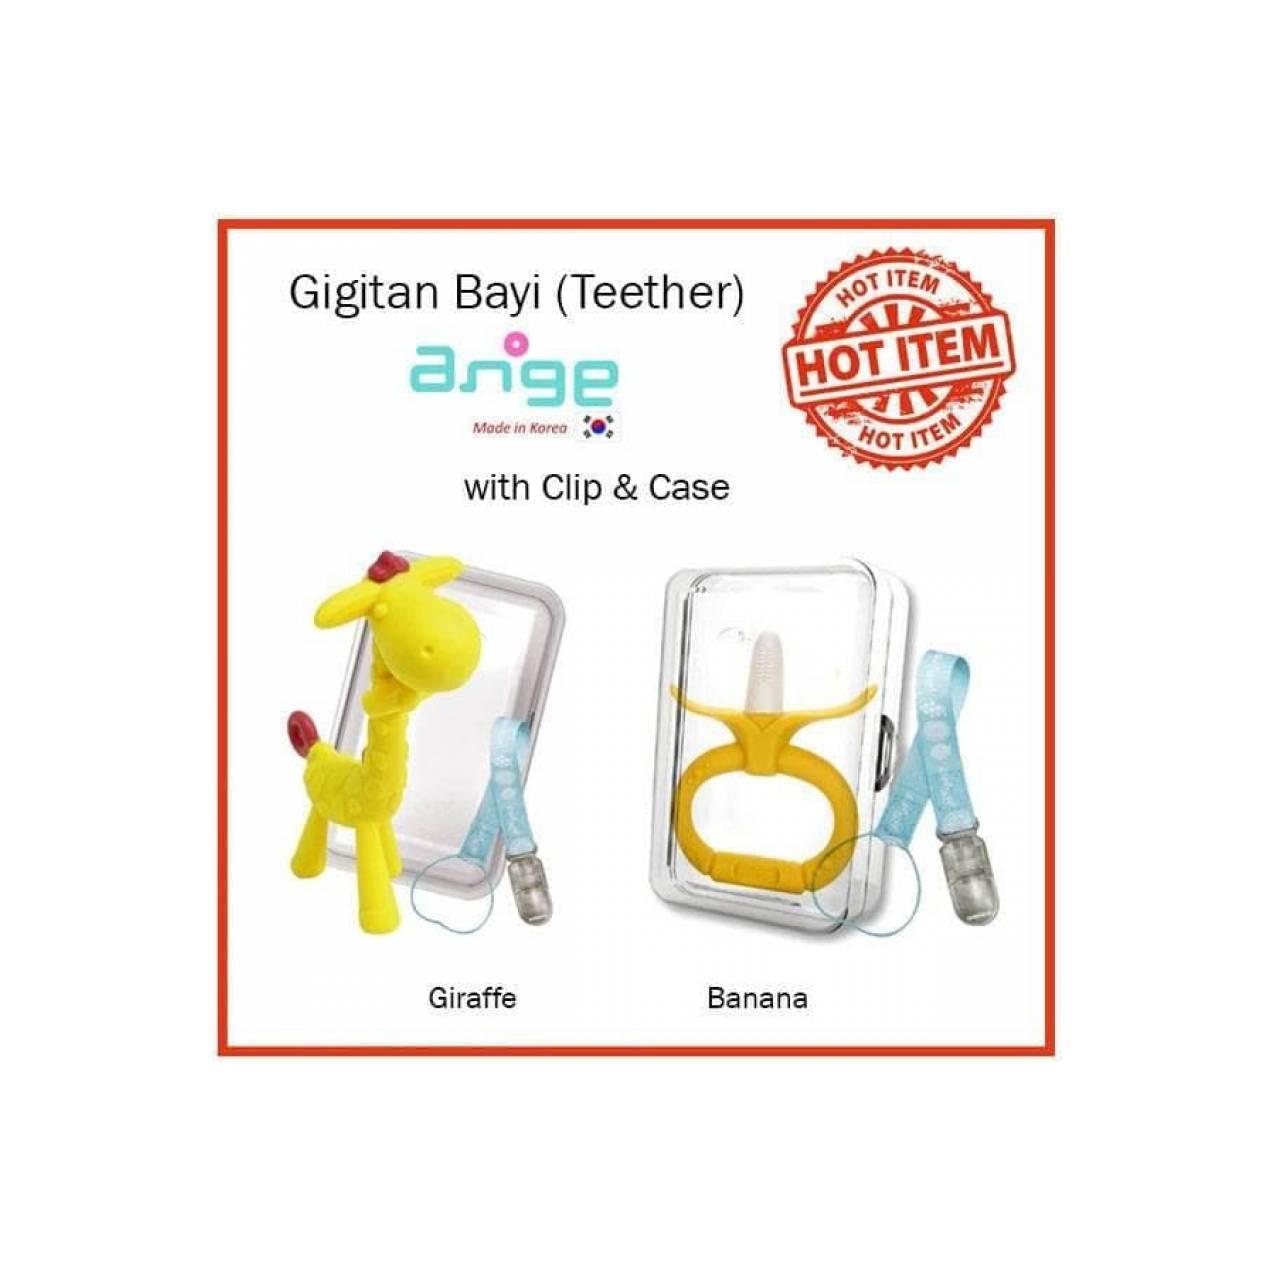 Baby Banana Toothbrush Sikat Gigi Bayi Teether Perlengkapan Com And Source Gigitan Ange Big